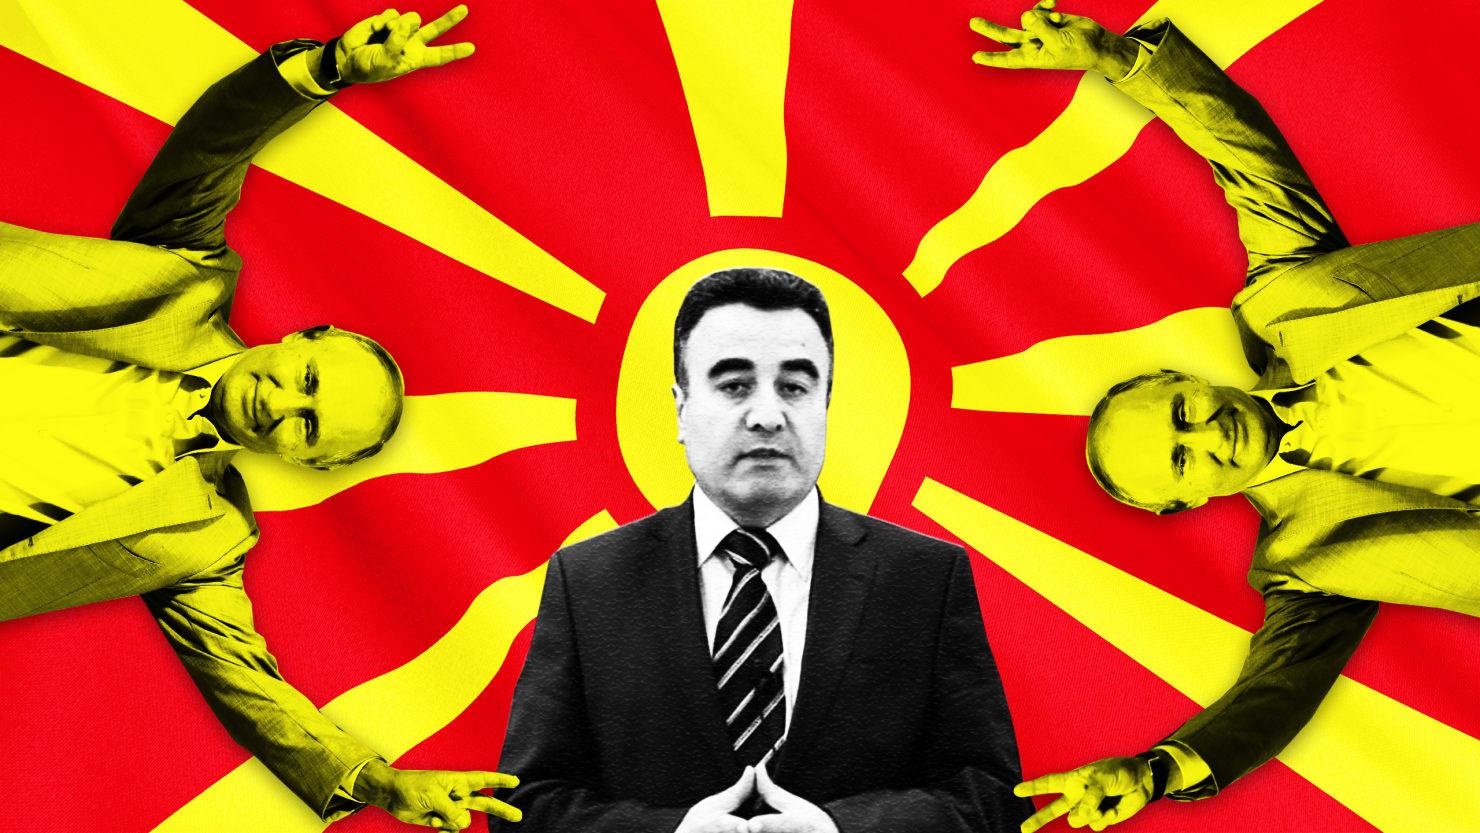 https://img.thedailybeast.com/image/upload/c_crop,d_placeholder_euli9k,h_1440,w_2560,x_0,y_0/dpr_2.0/c_limit,w_740/fl_lossy,q_auto/v1541438130/181026-nemtsova-macedonia-hero_c1xyf9